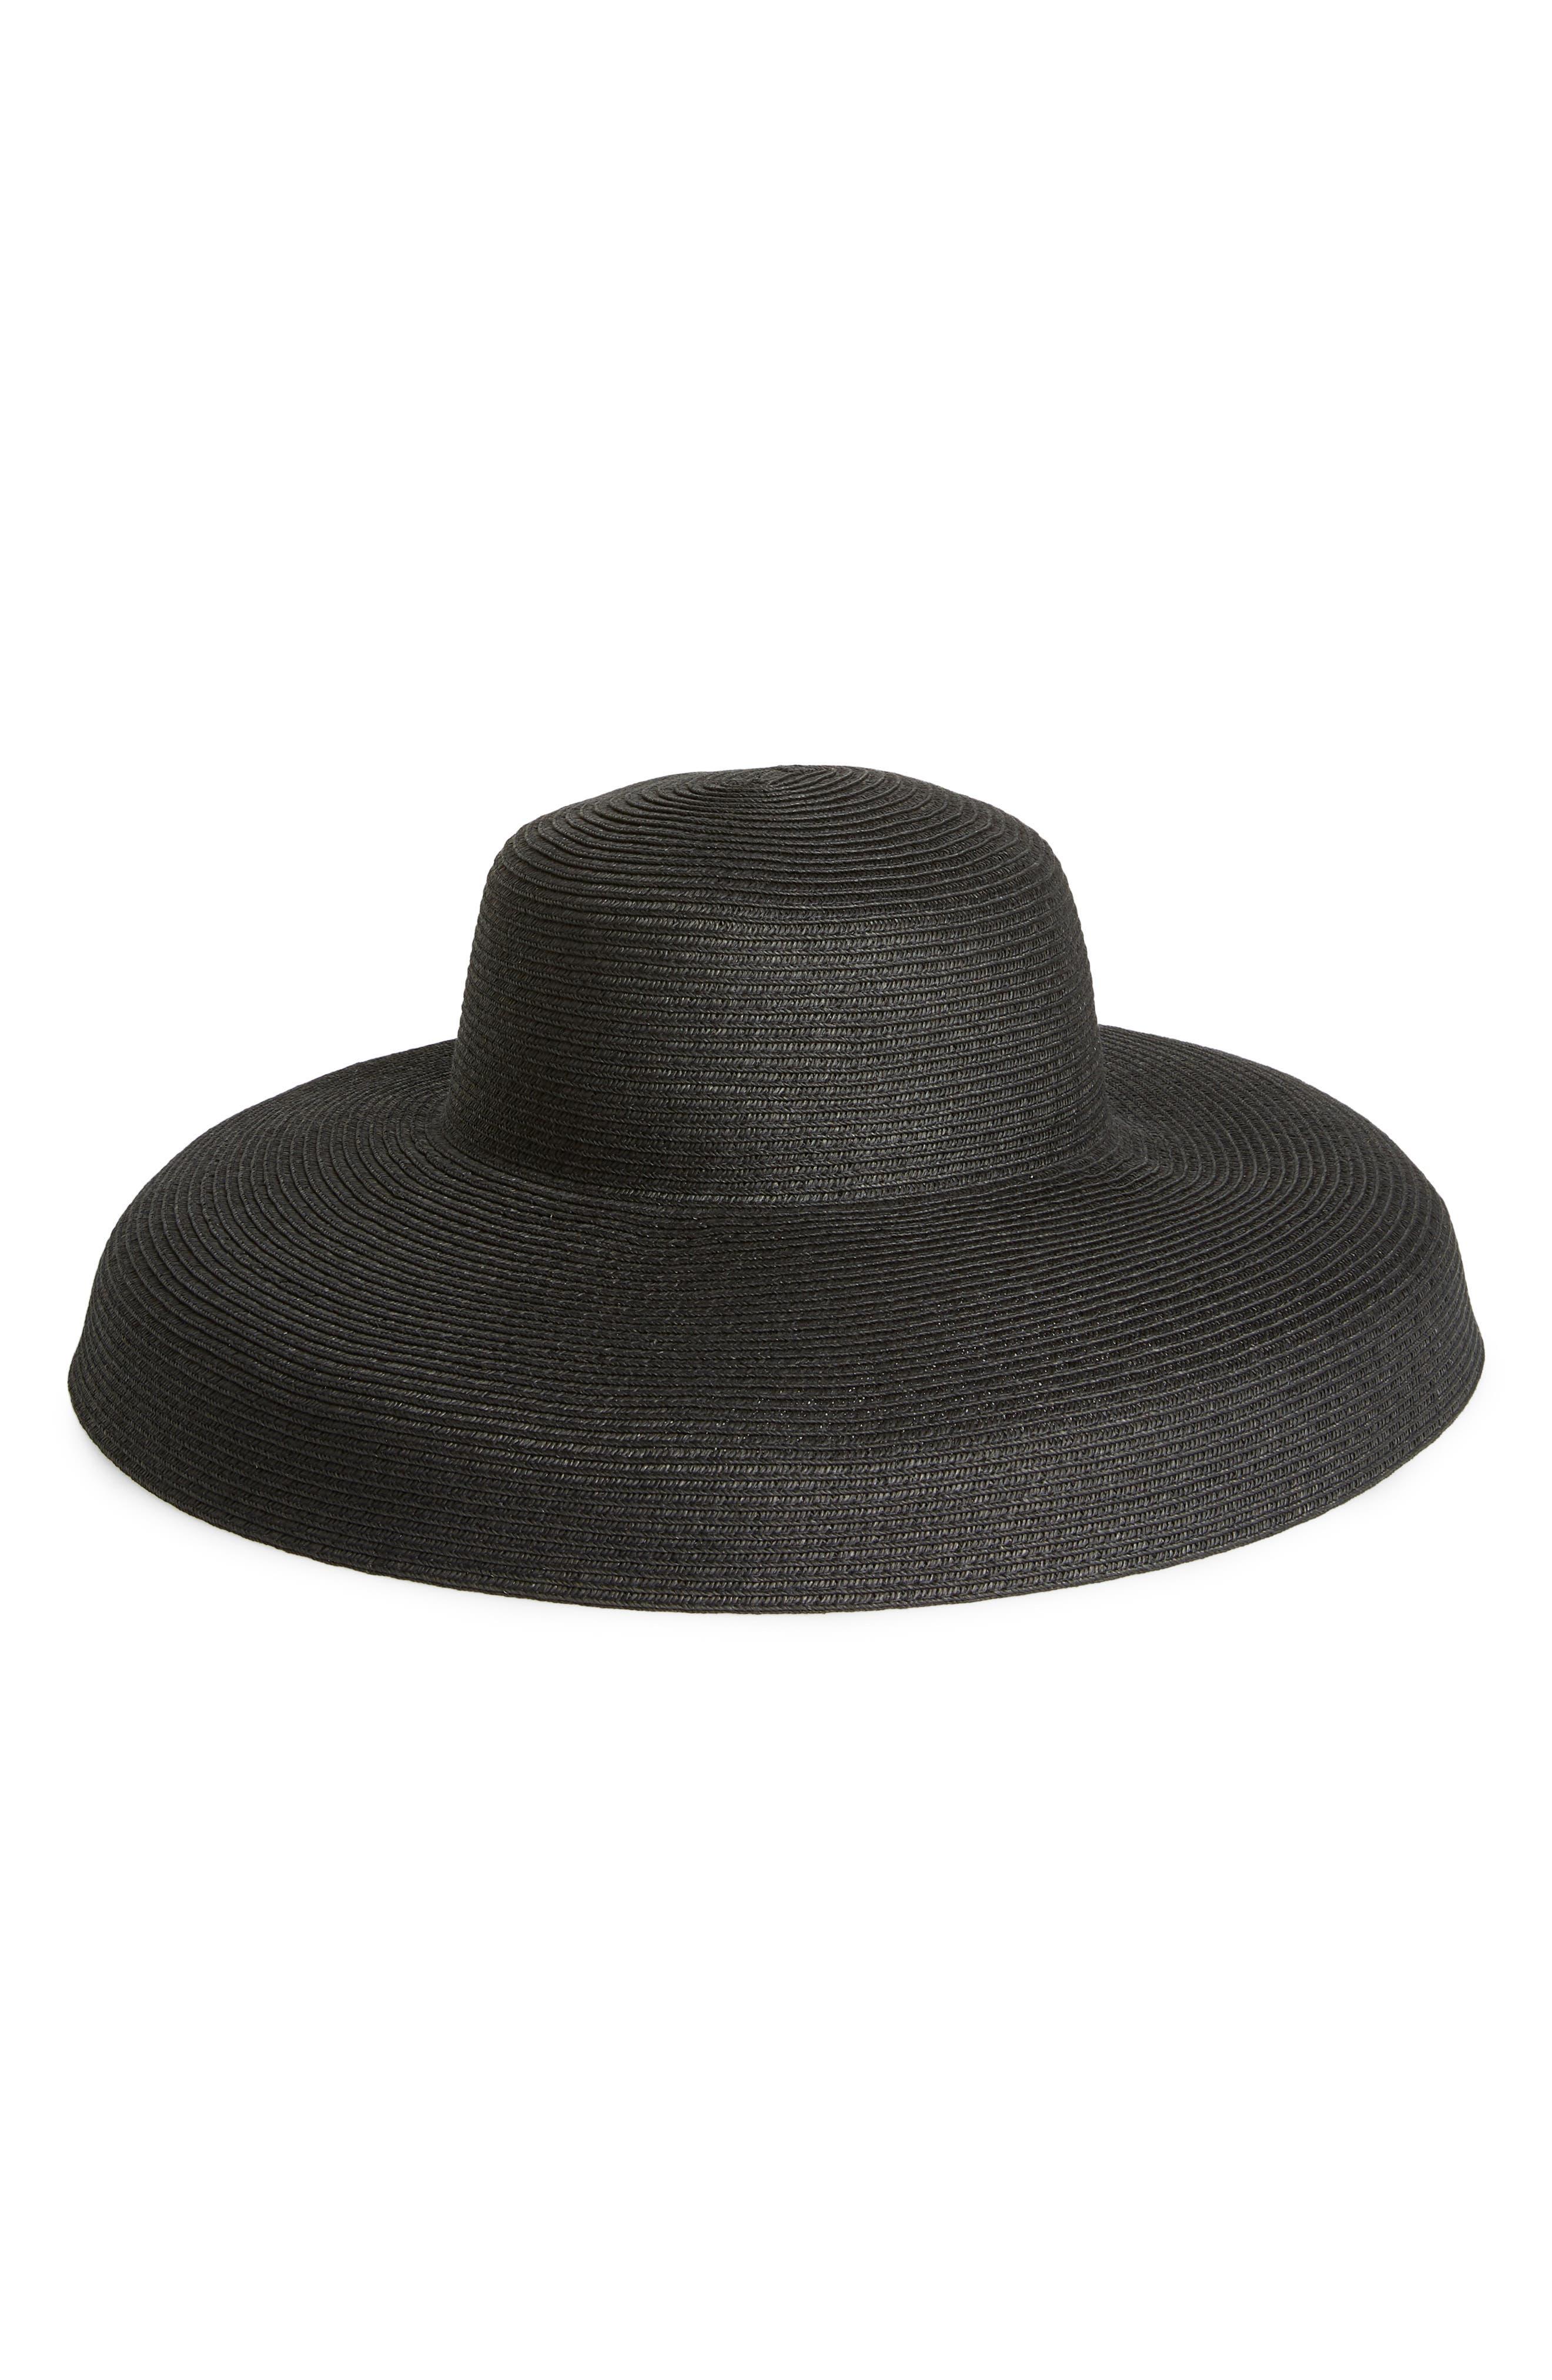 Ultrabraid XL Brim Hat,                             Main thumbnail 1, color,                             BLACK